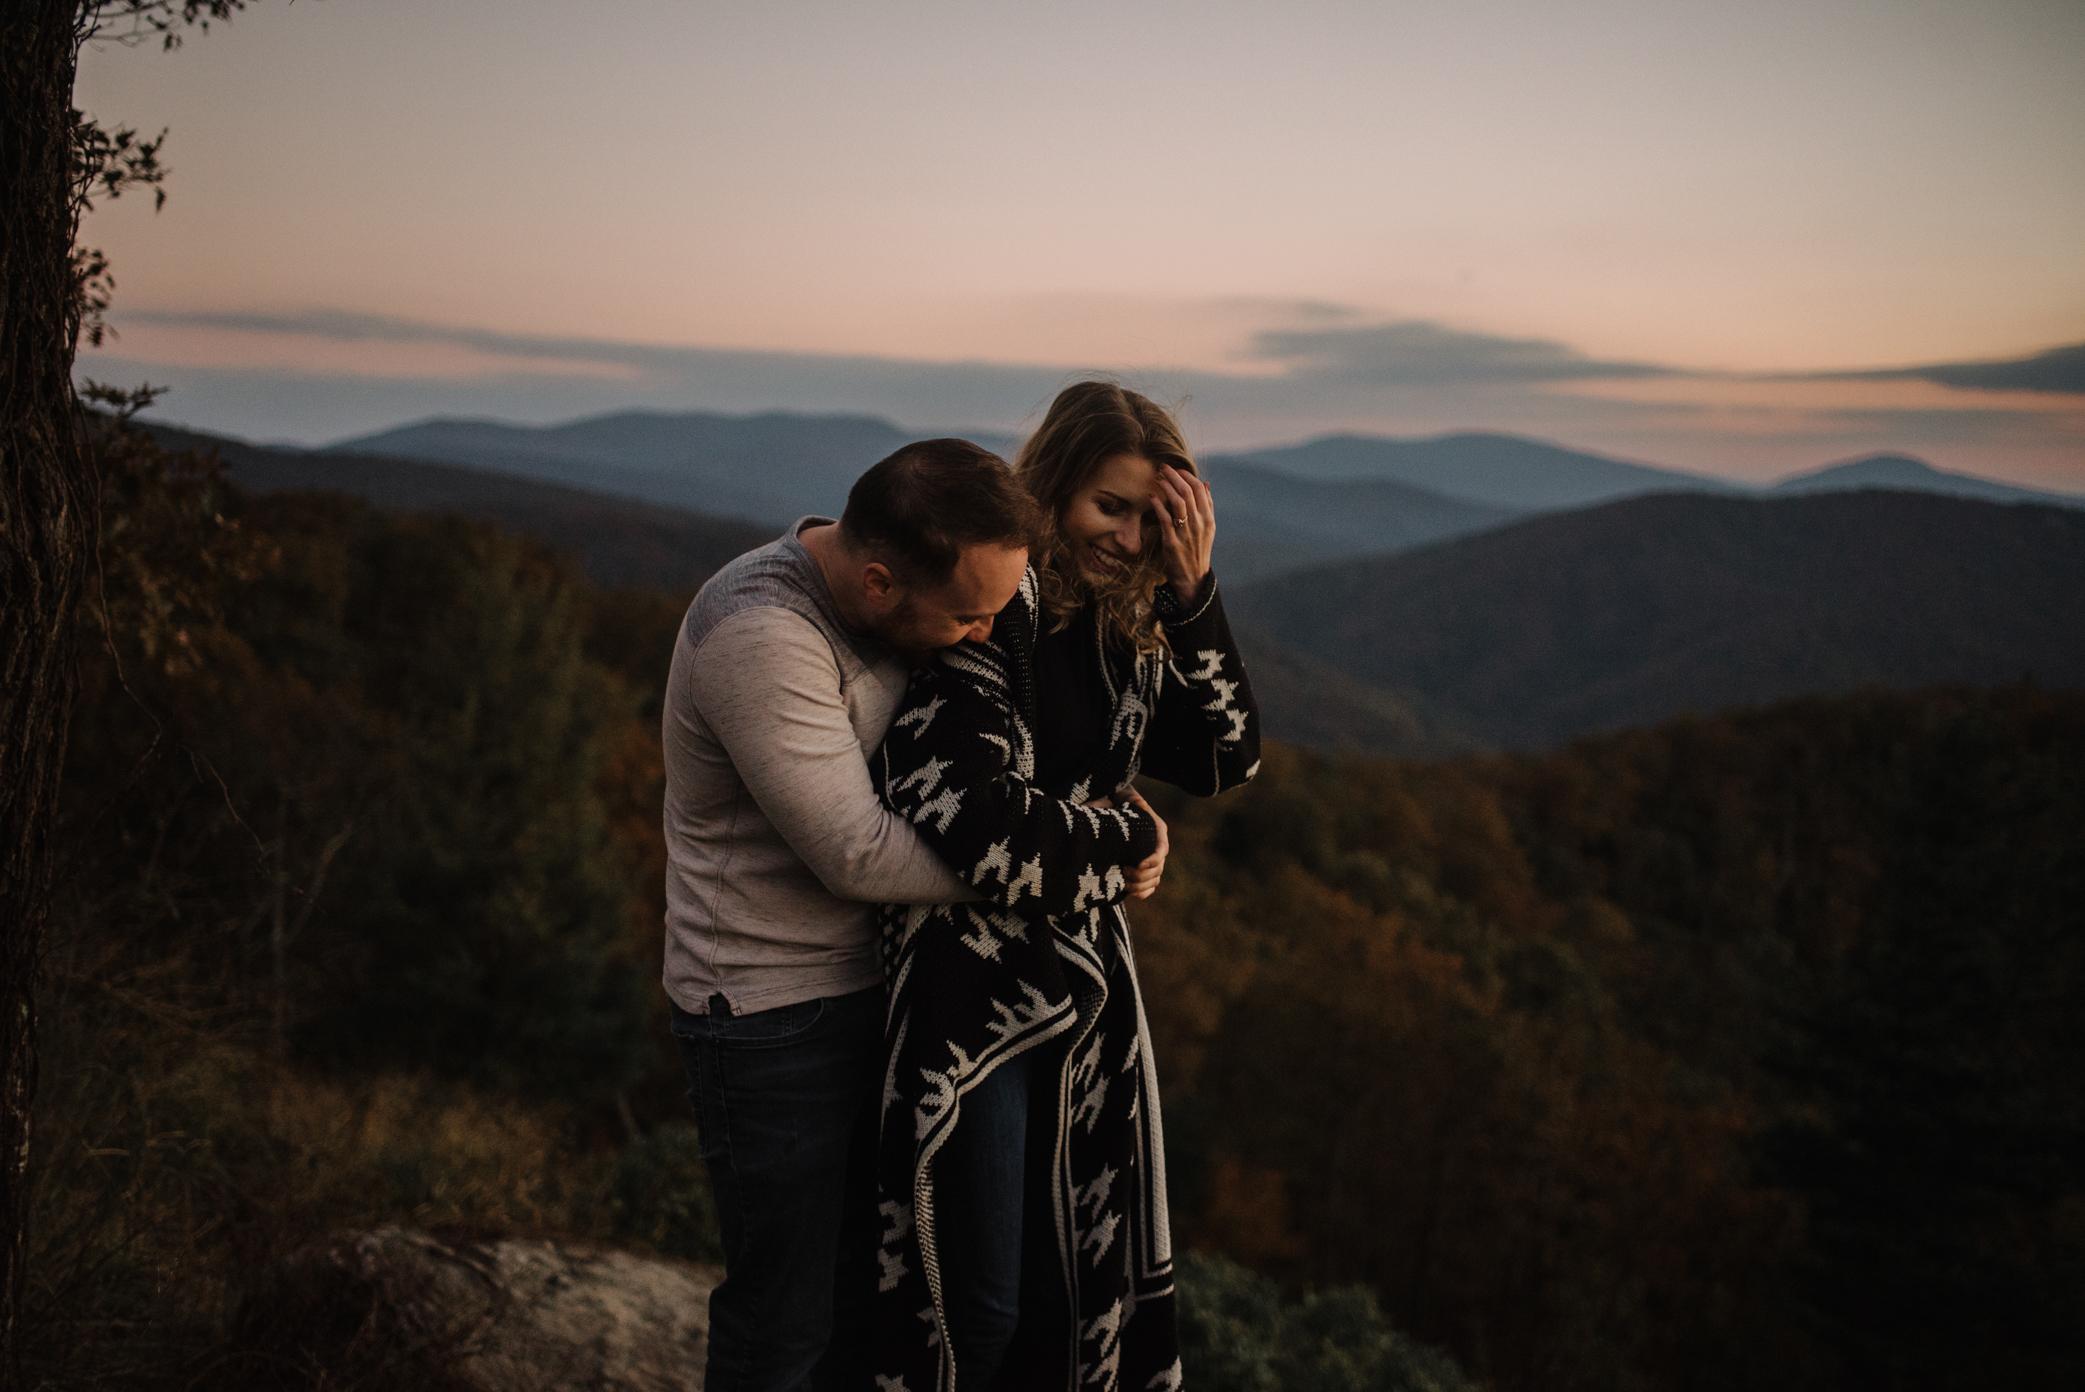 Macy and Mark - Shenandoah National Park - Fall Autumn Sunrise Couple Adventure Session - White Sails Creative - Mini Session_4.JPG